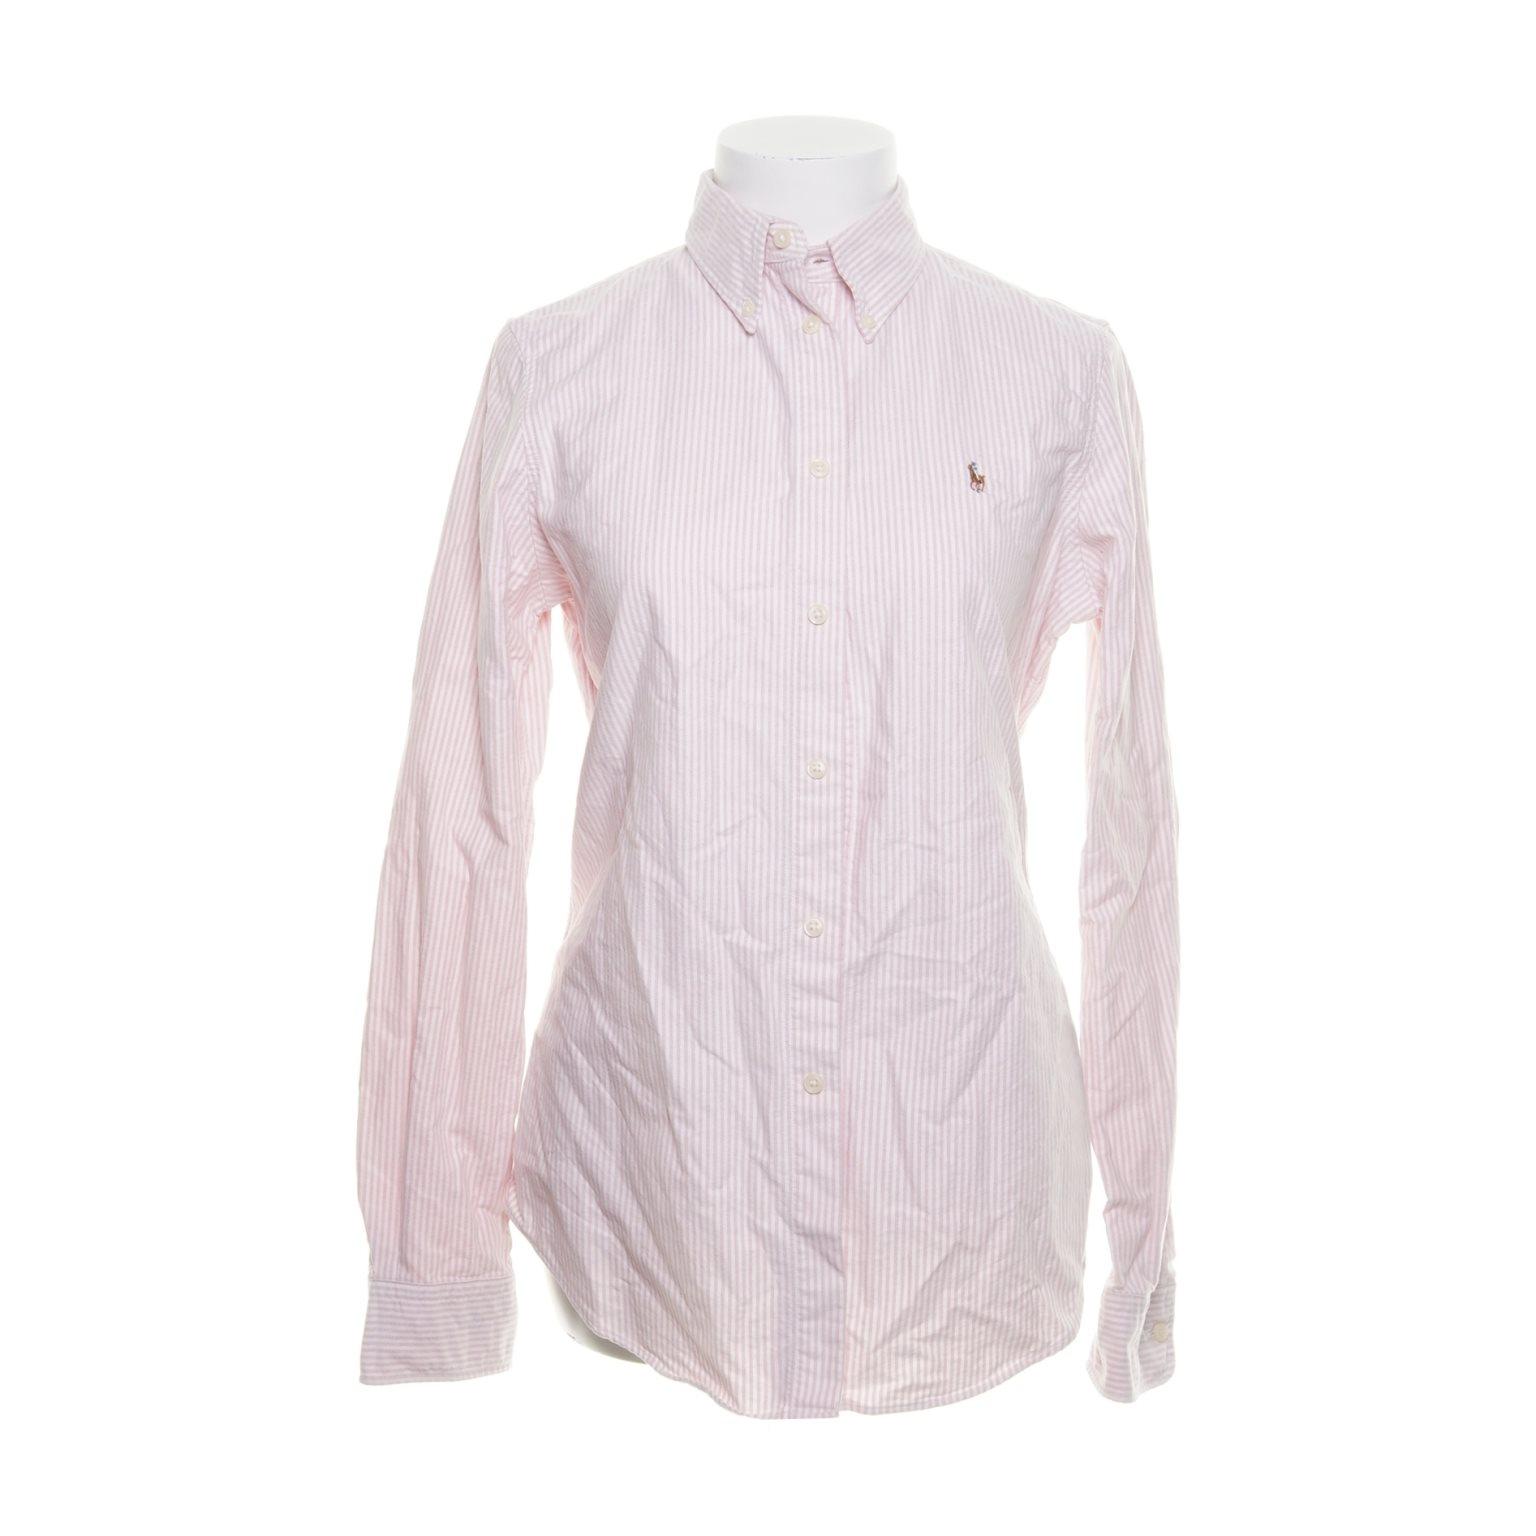 vit polo skjorta